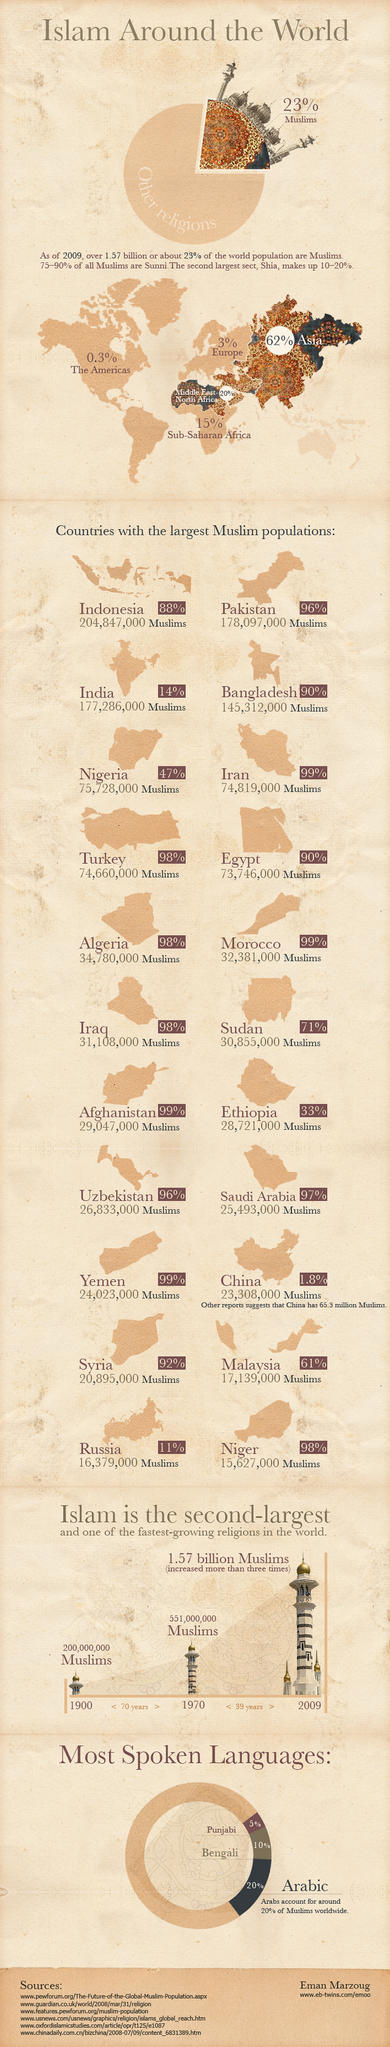 Islam around the world - Infographic (English) by e-emoo